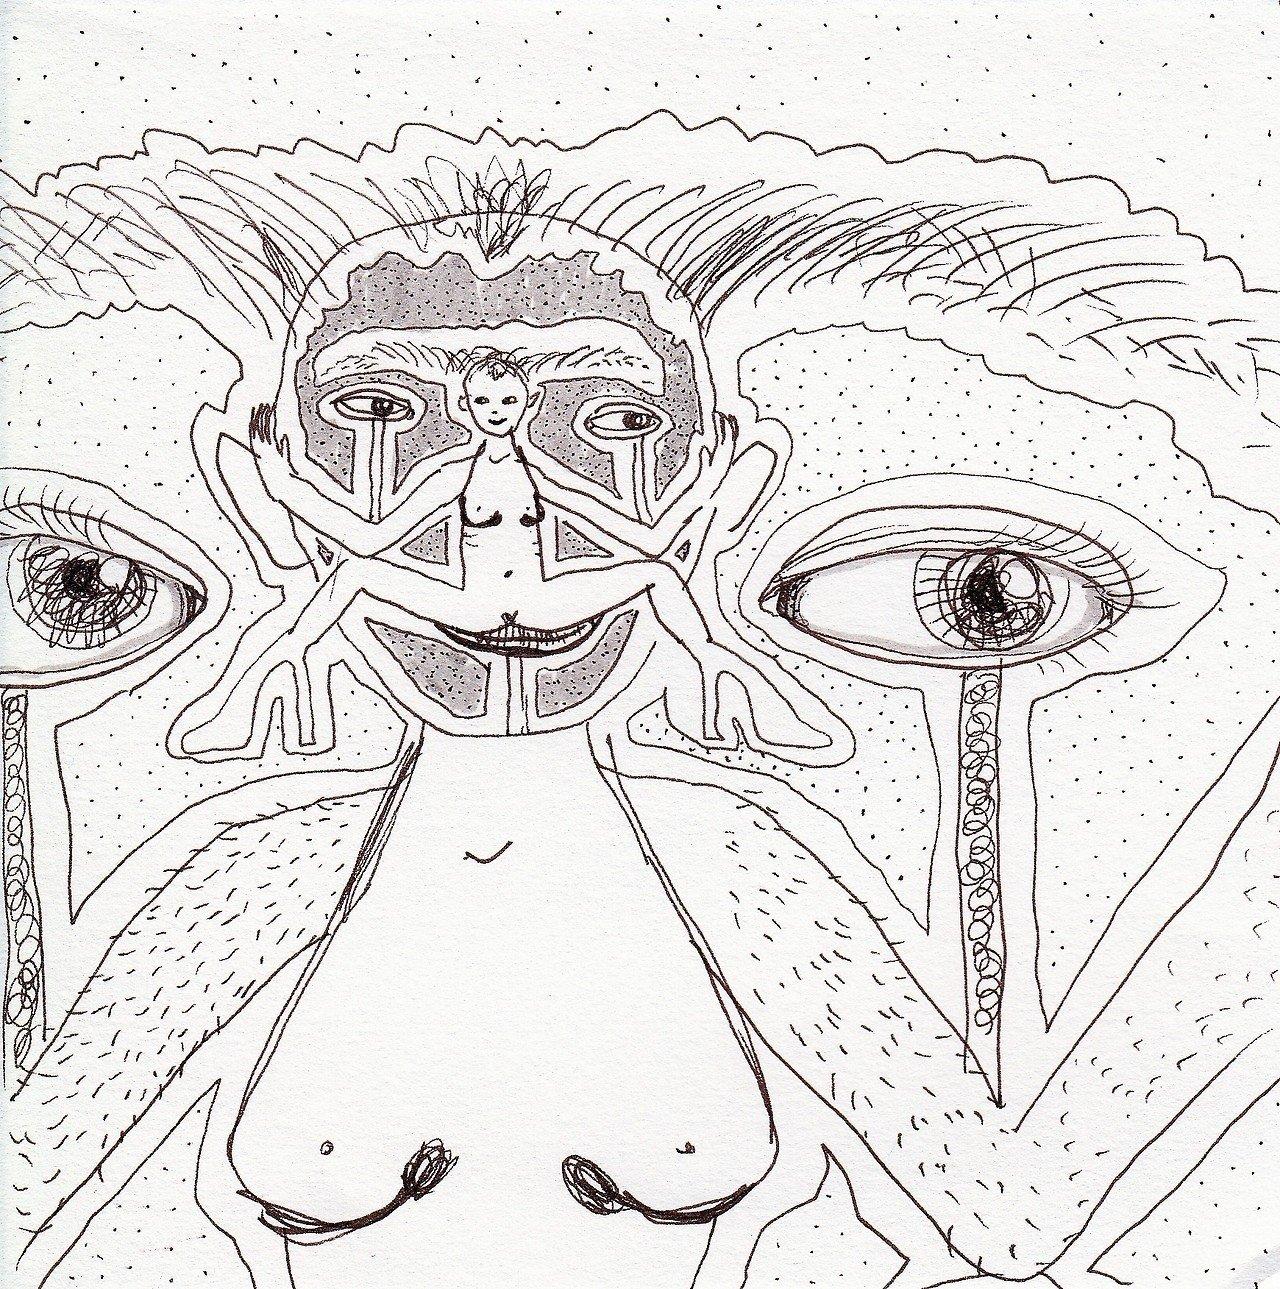 Marlene Steyn / You knee brow